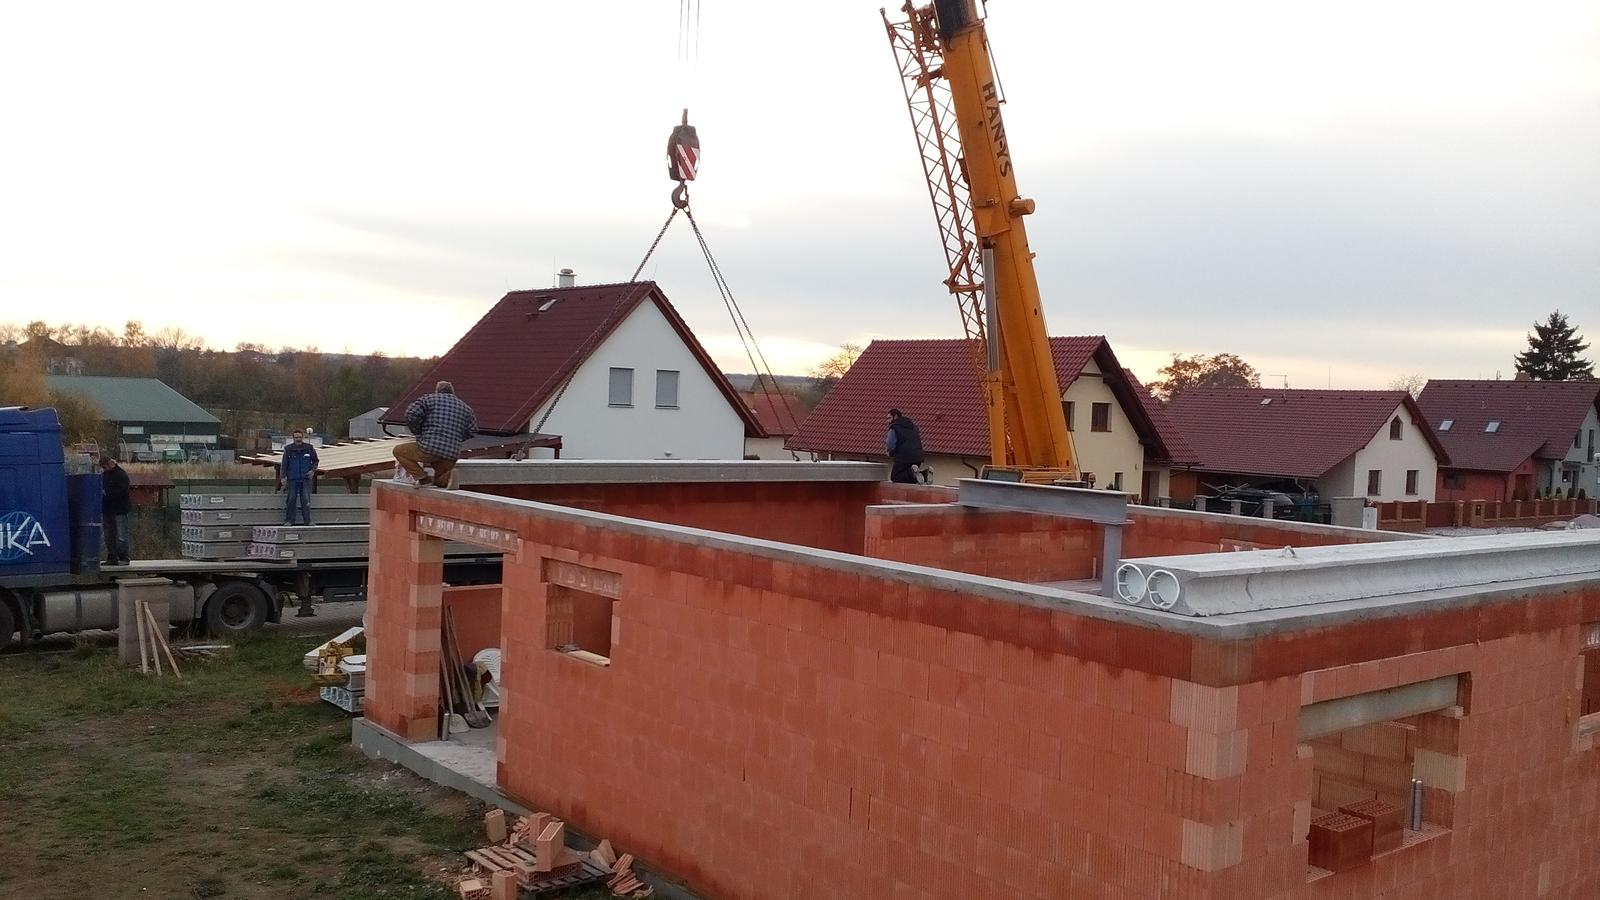 Stavba v kostce - zas o trošku výš